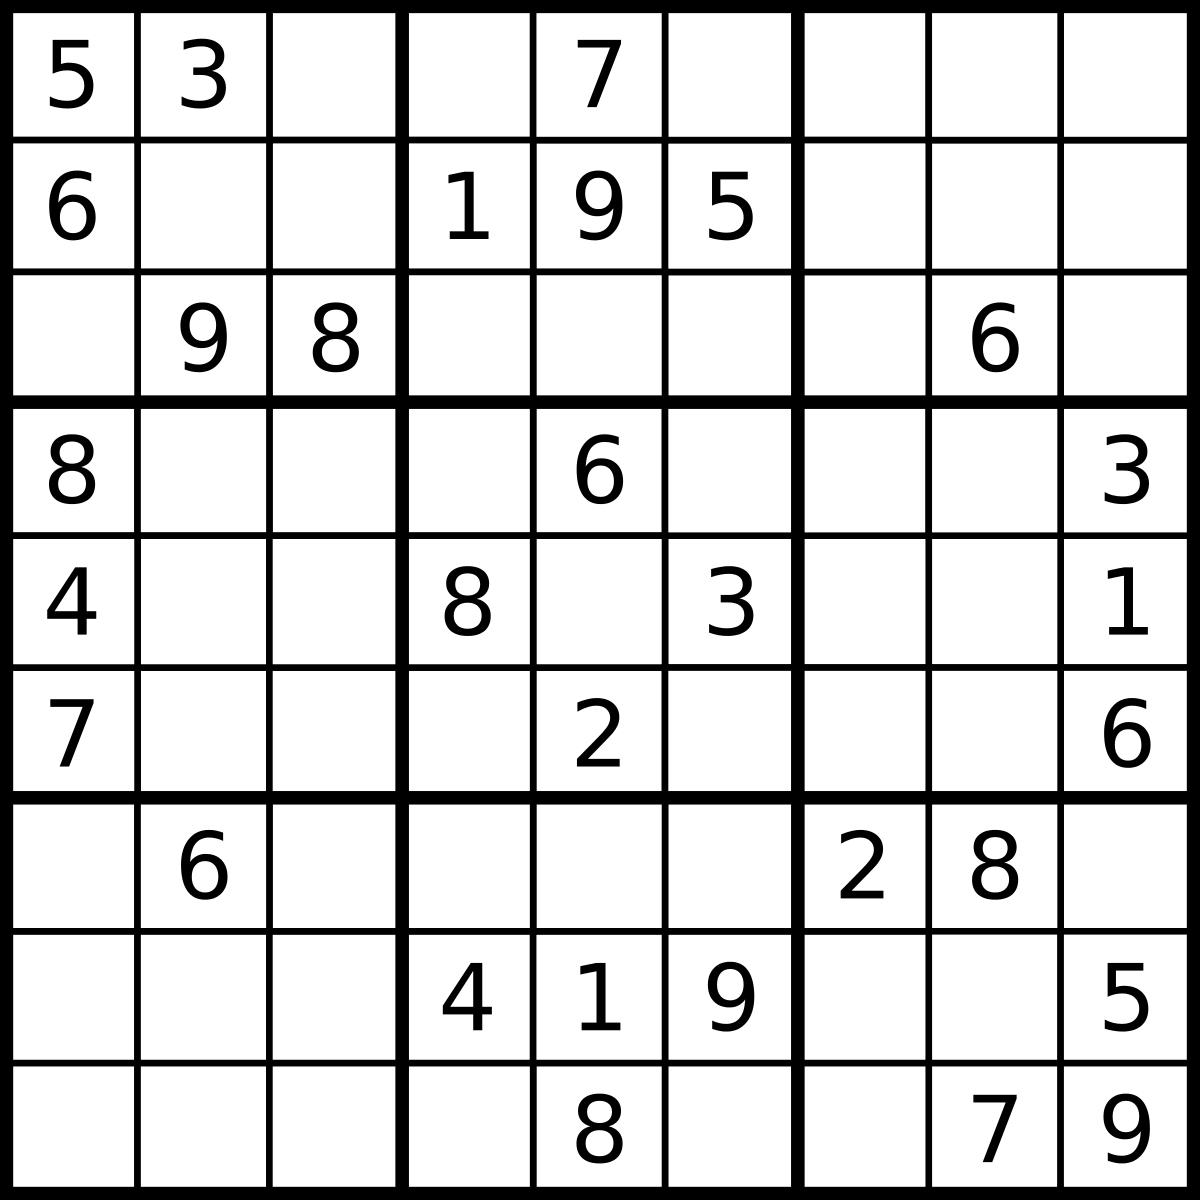 Sudoku Printable Grid Postedsarah Cunningham